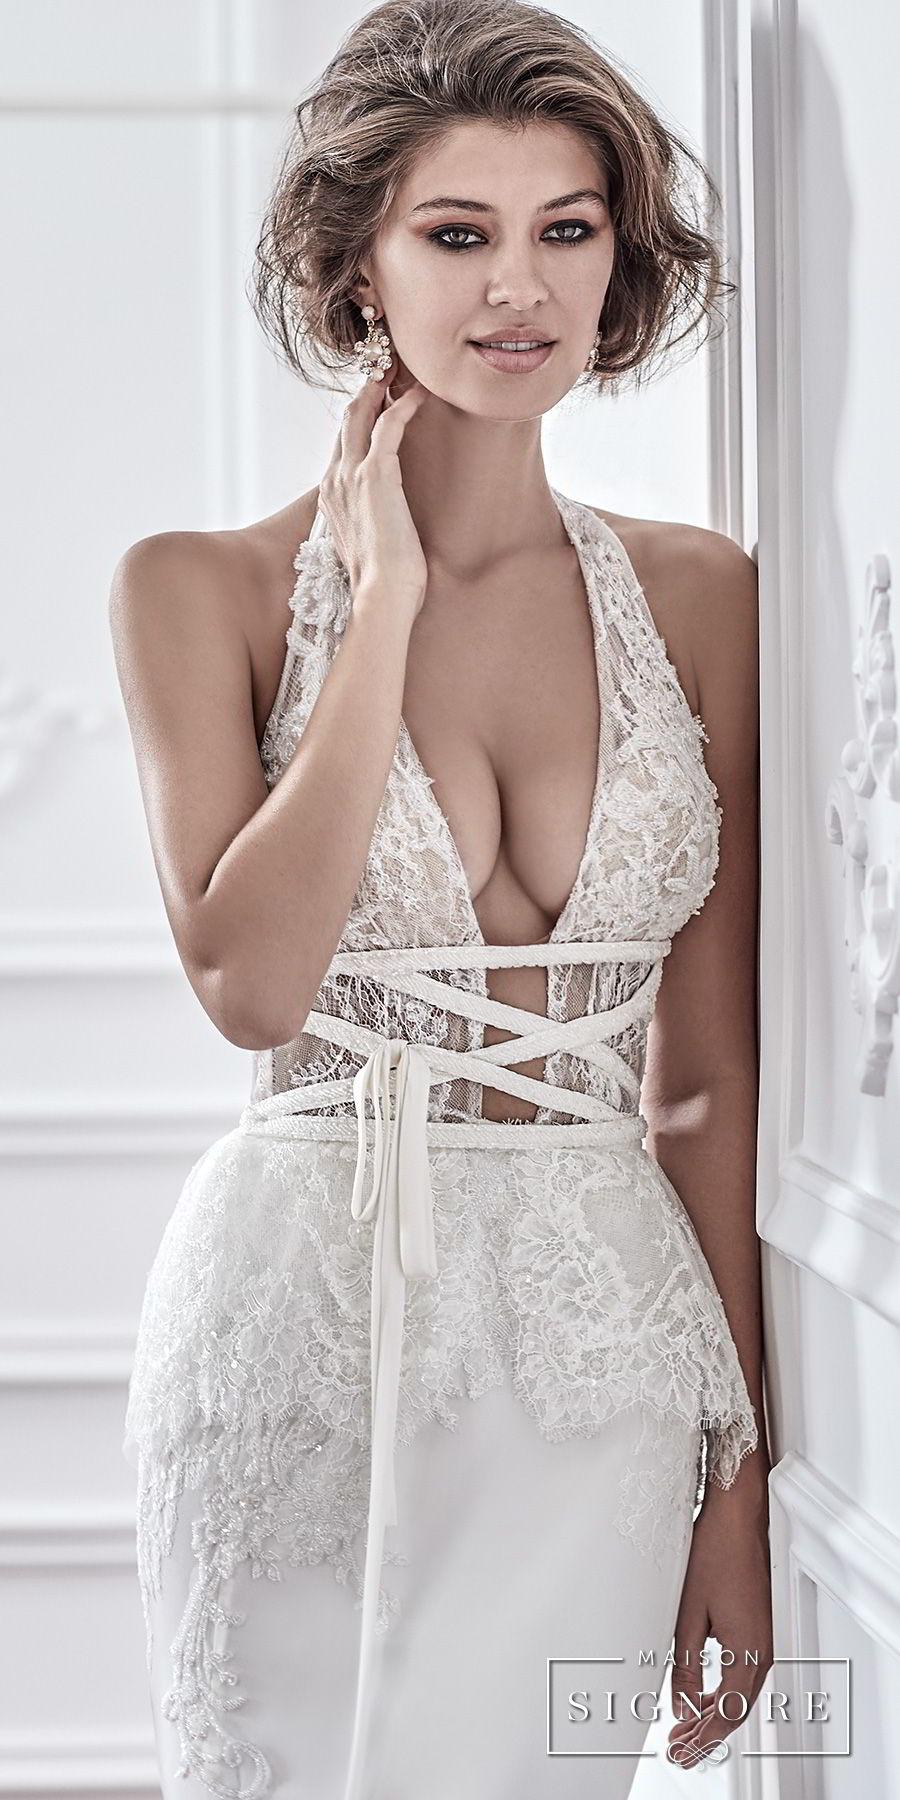 maison signore 2018 bridal sleeveless halter neck deep plunging v neck heavily embellished bodice elegant sexy fit and flare sheath wedding dress medium train (dafne) zv